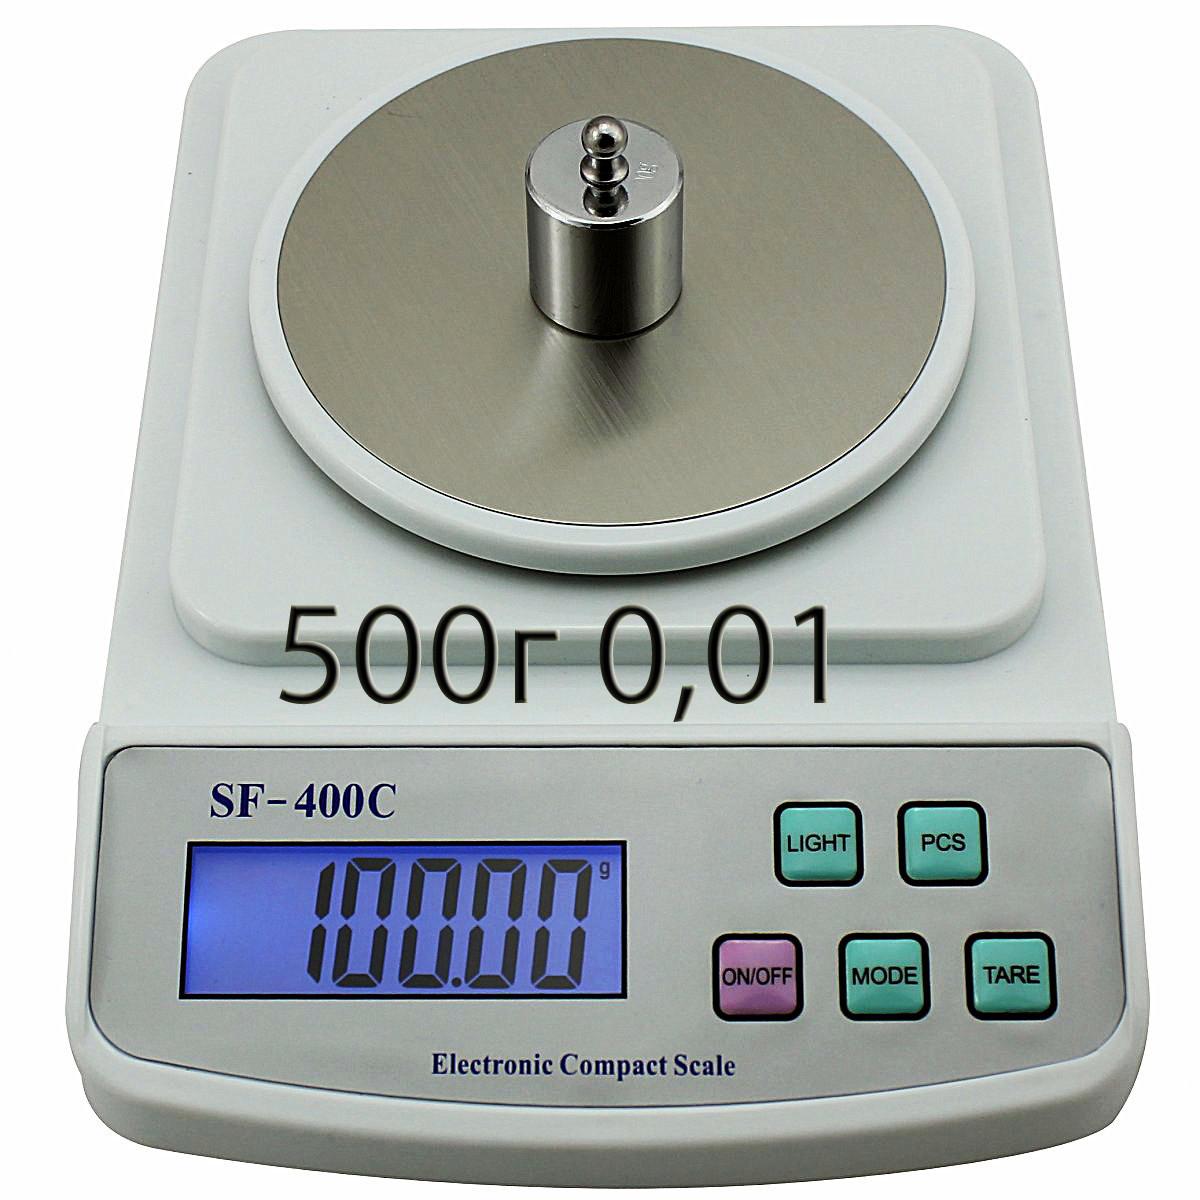 Весы электронные серии SF-400C (500г/0,01г)